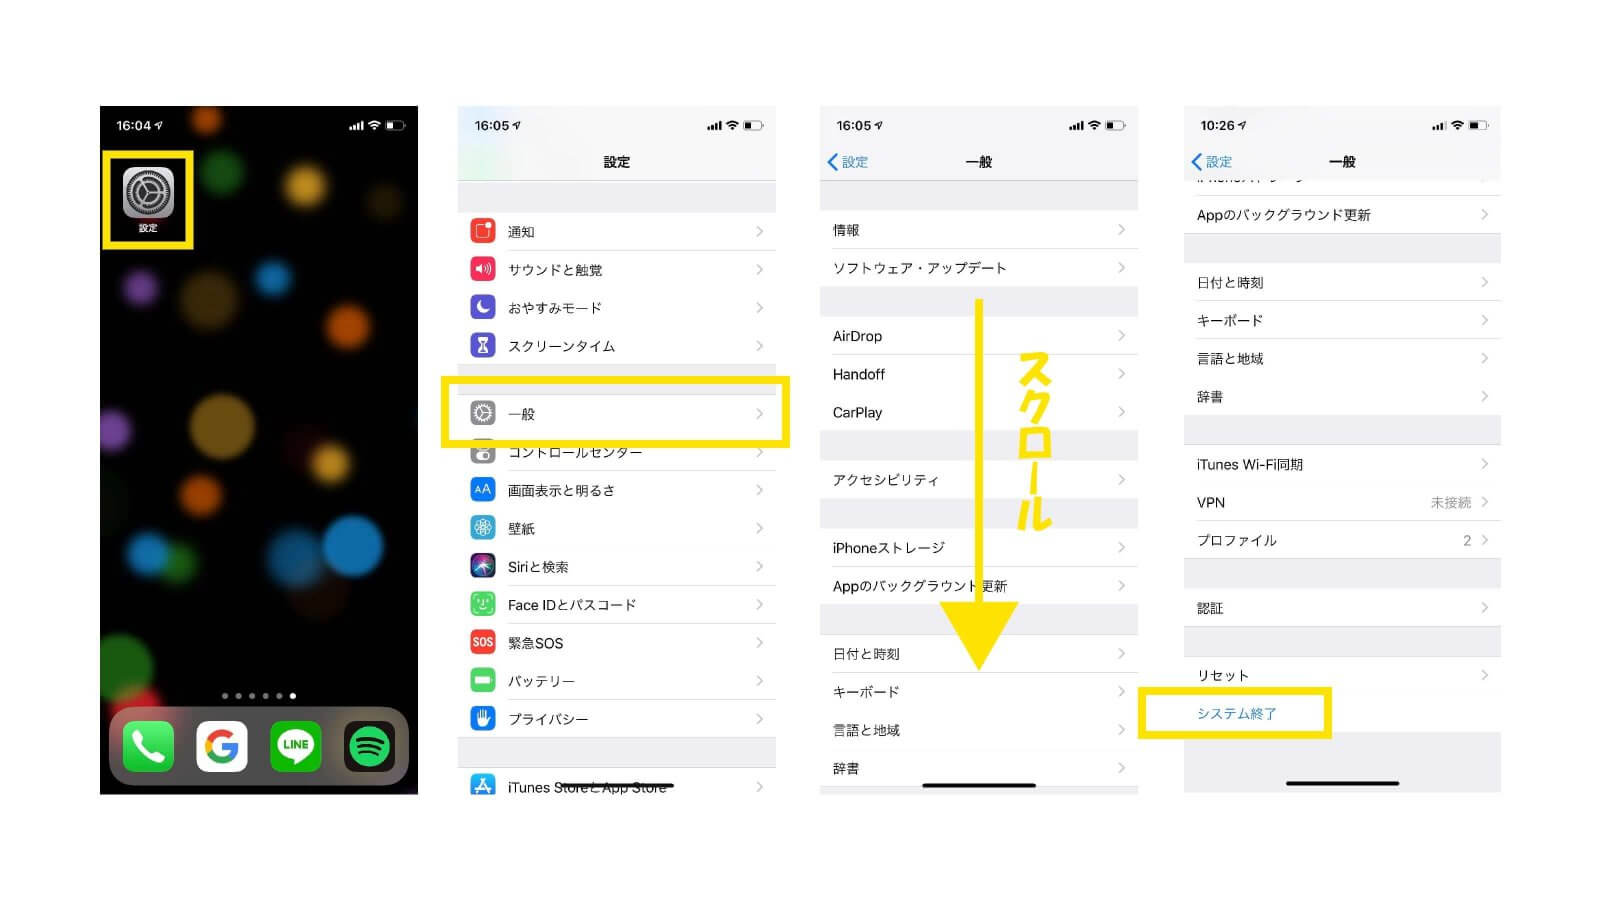 iphone操作。設定からiPhoneの電源を落とす方法。